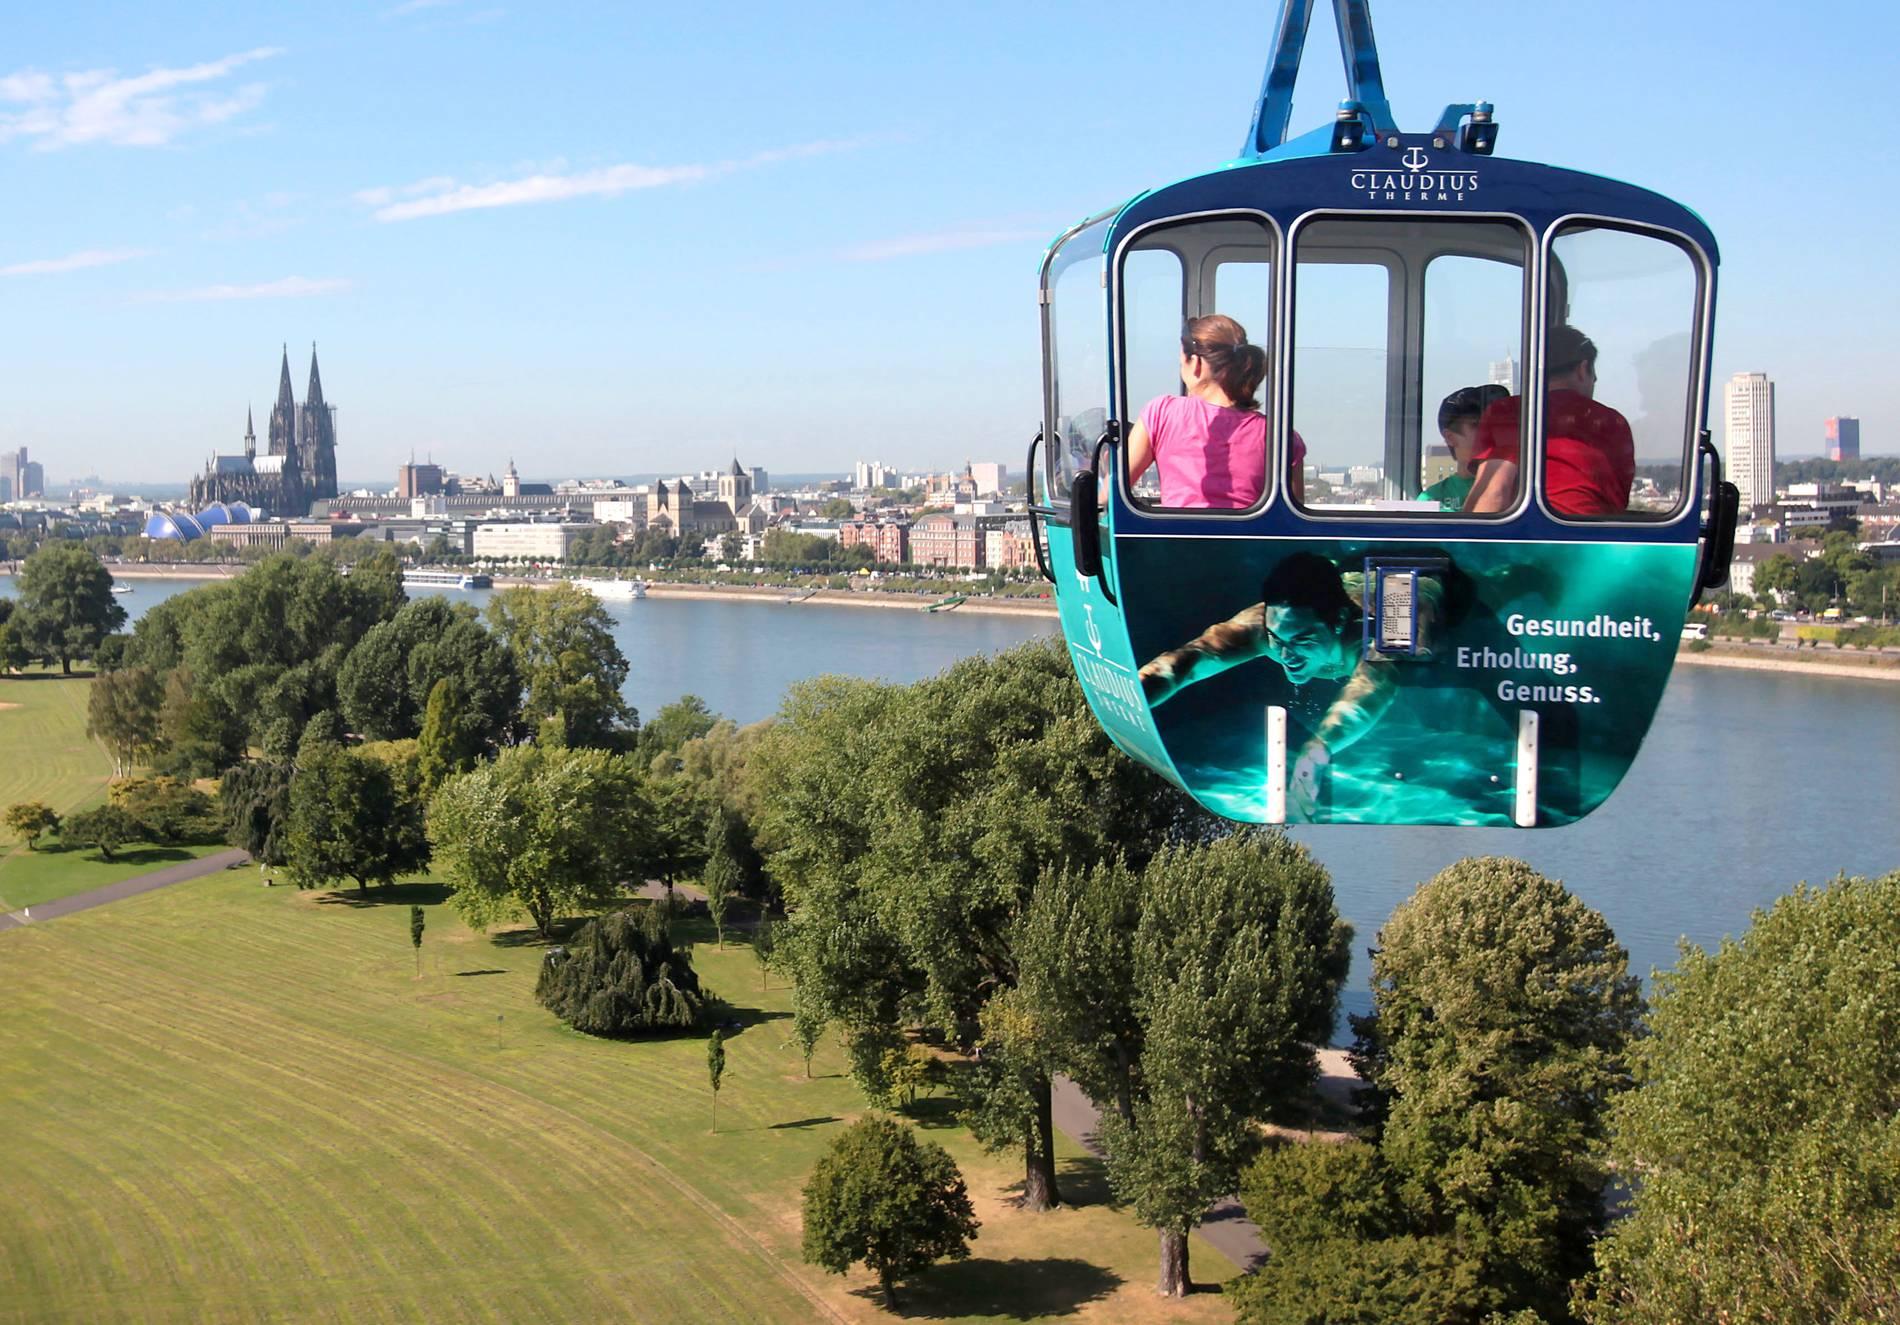 Köln: Seilbahn soll spätestens zu Ostern 2019 wieder fahren